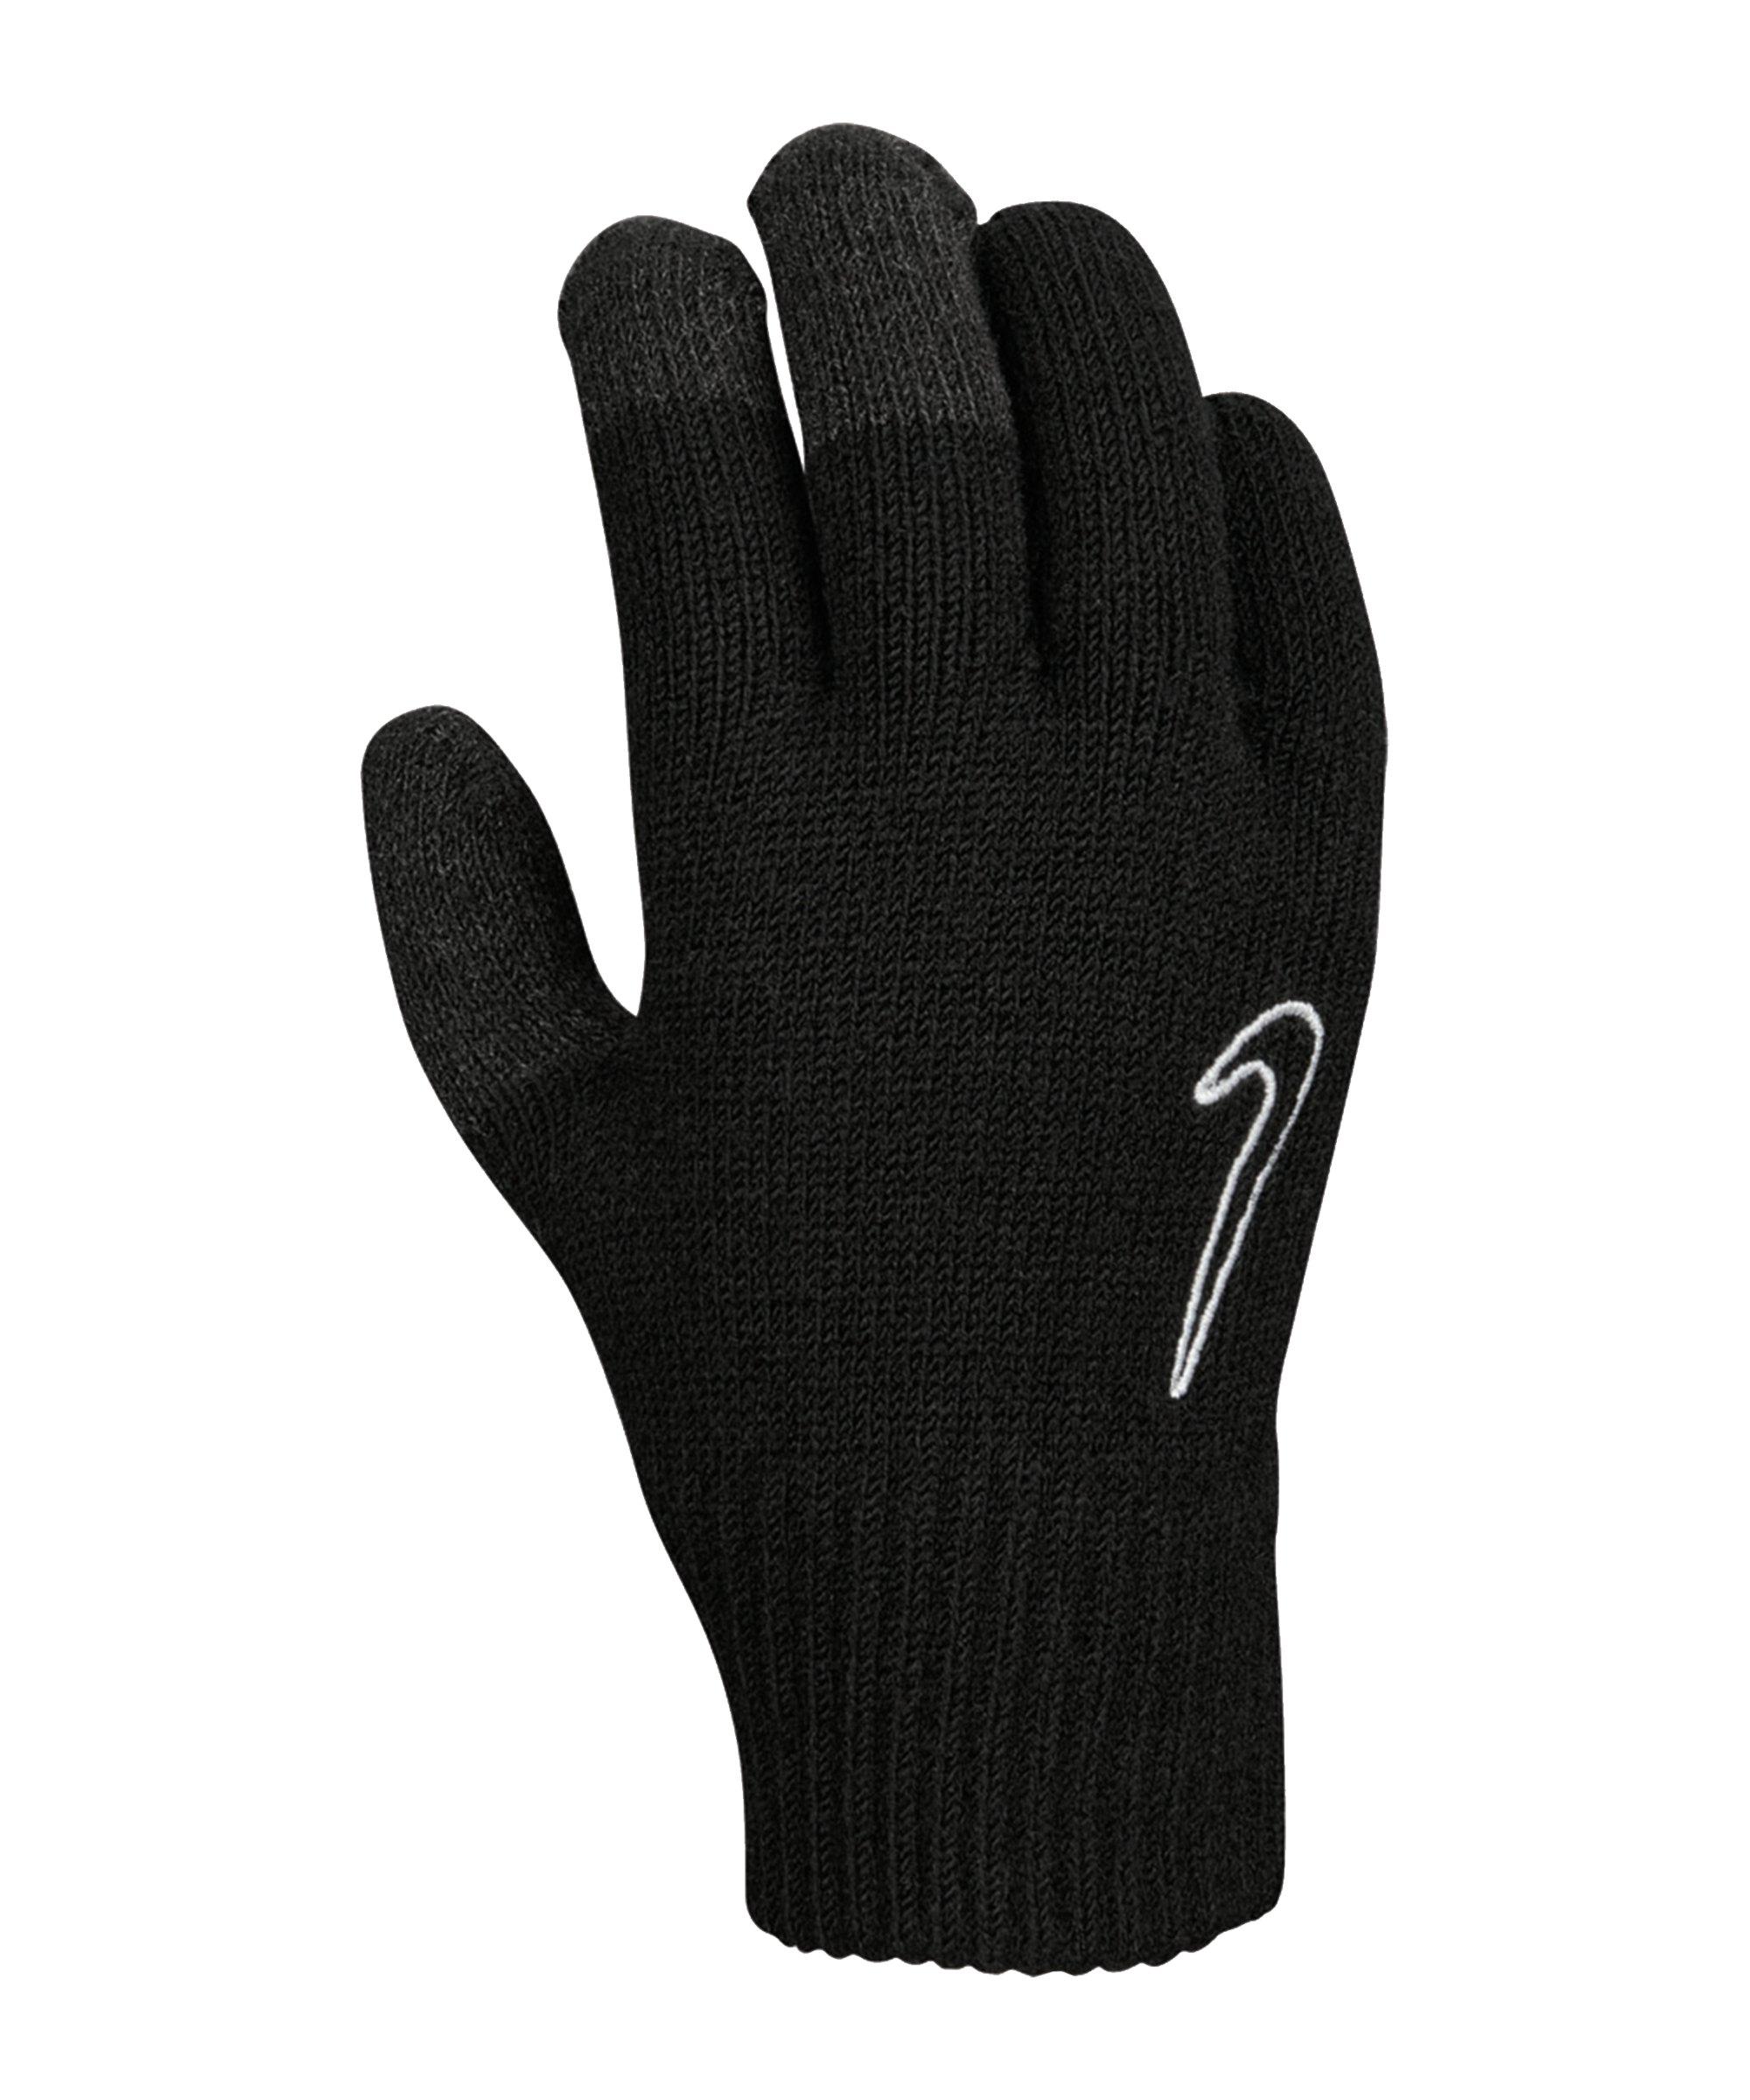 Nike Knitted Tech Grip Handschuhe 2.0 Kids F091 - schwarz